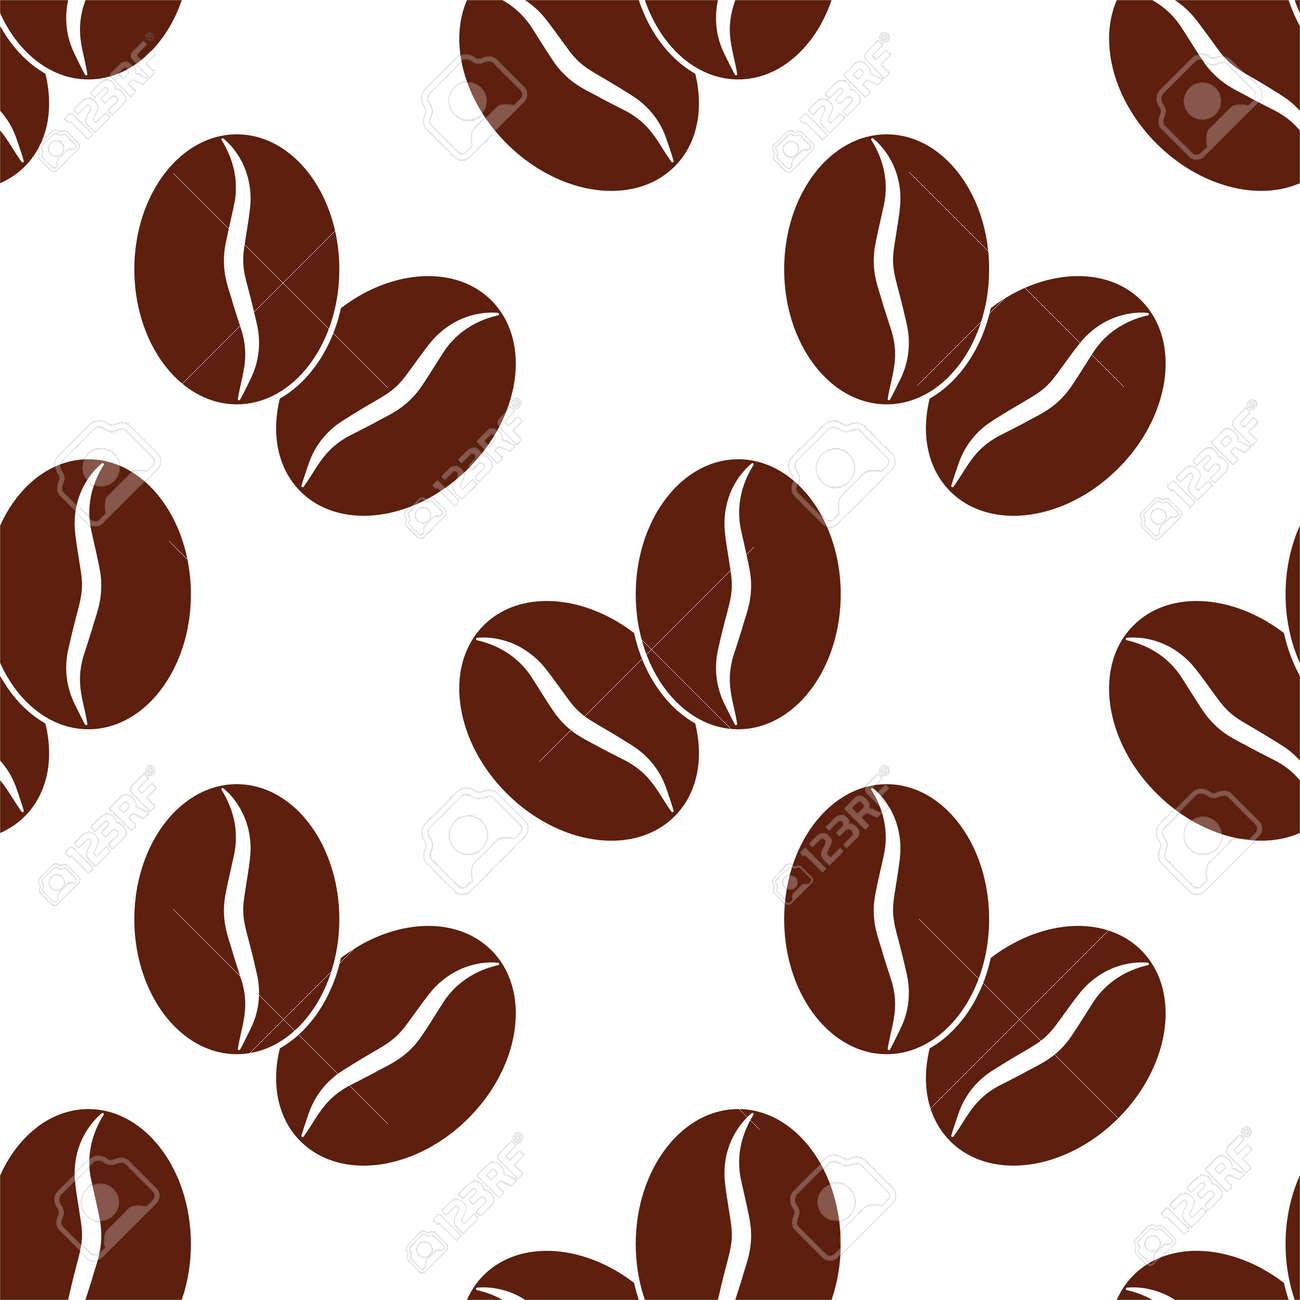 Coffee Bean Icon Seamless Pattern Vector Art Illustration - 148090751